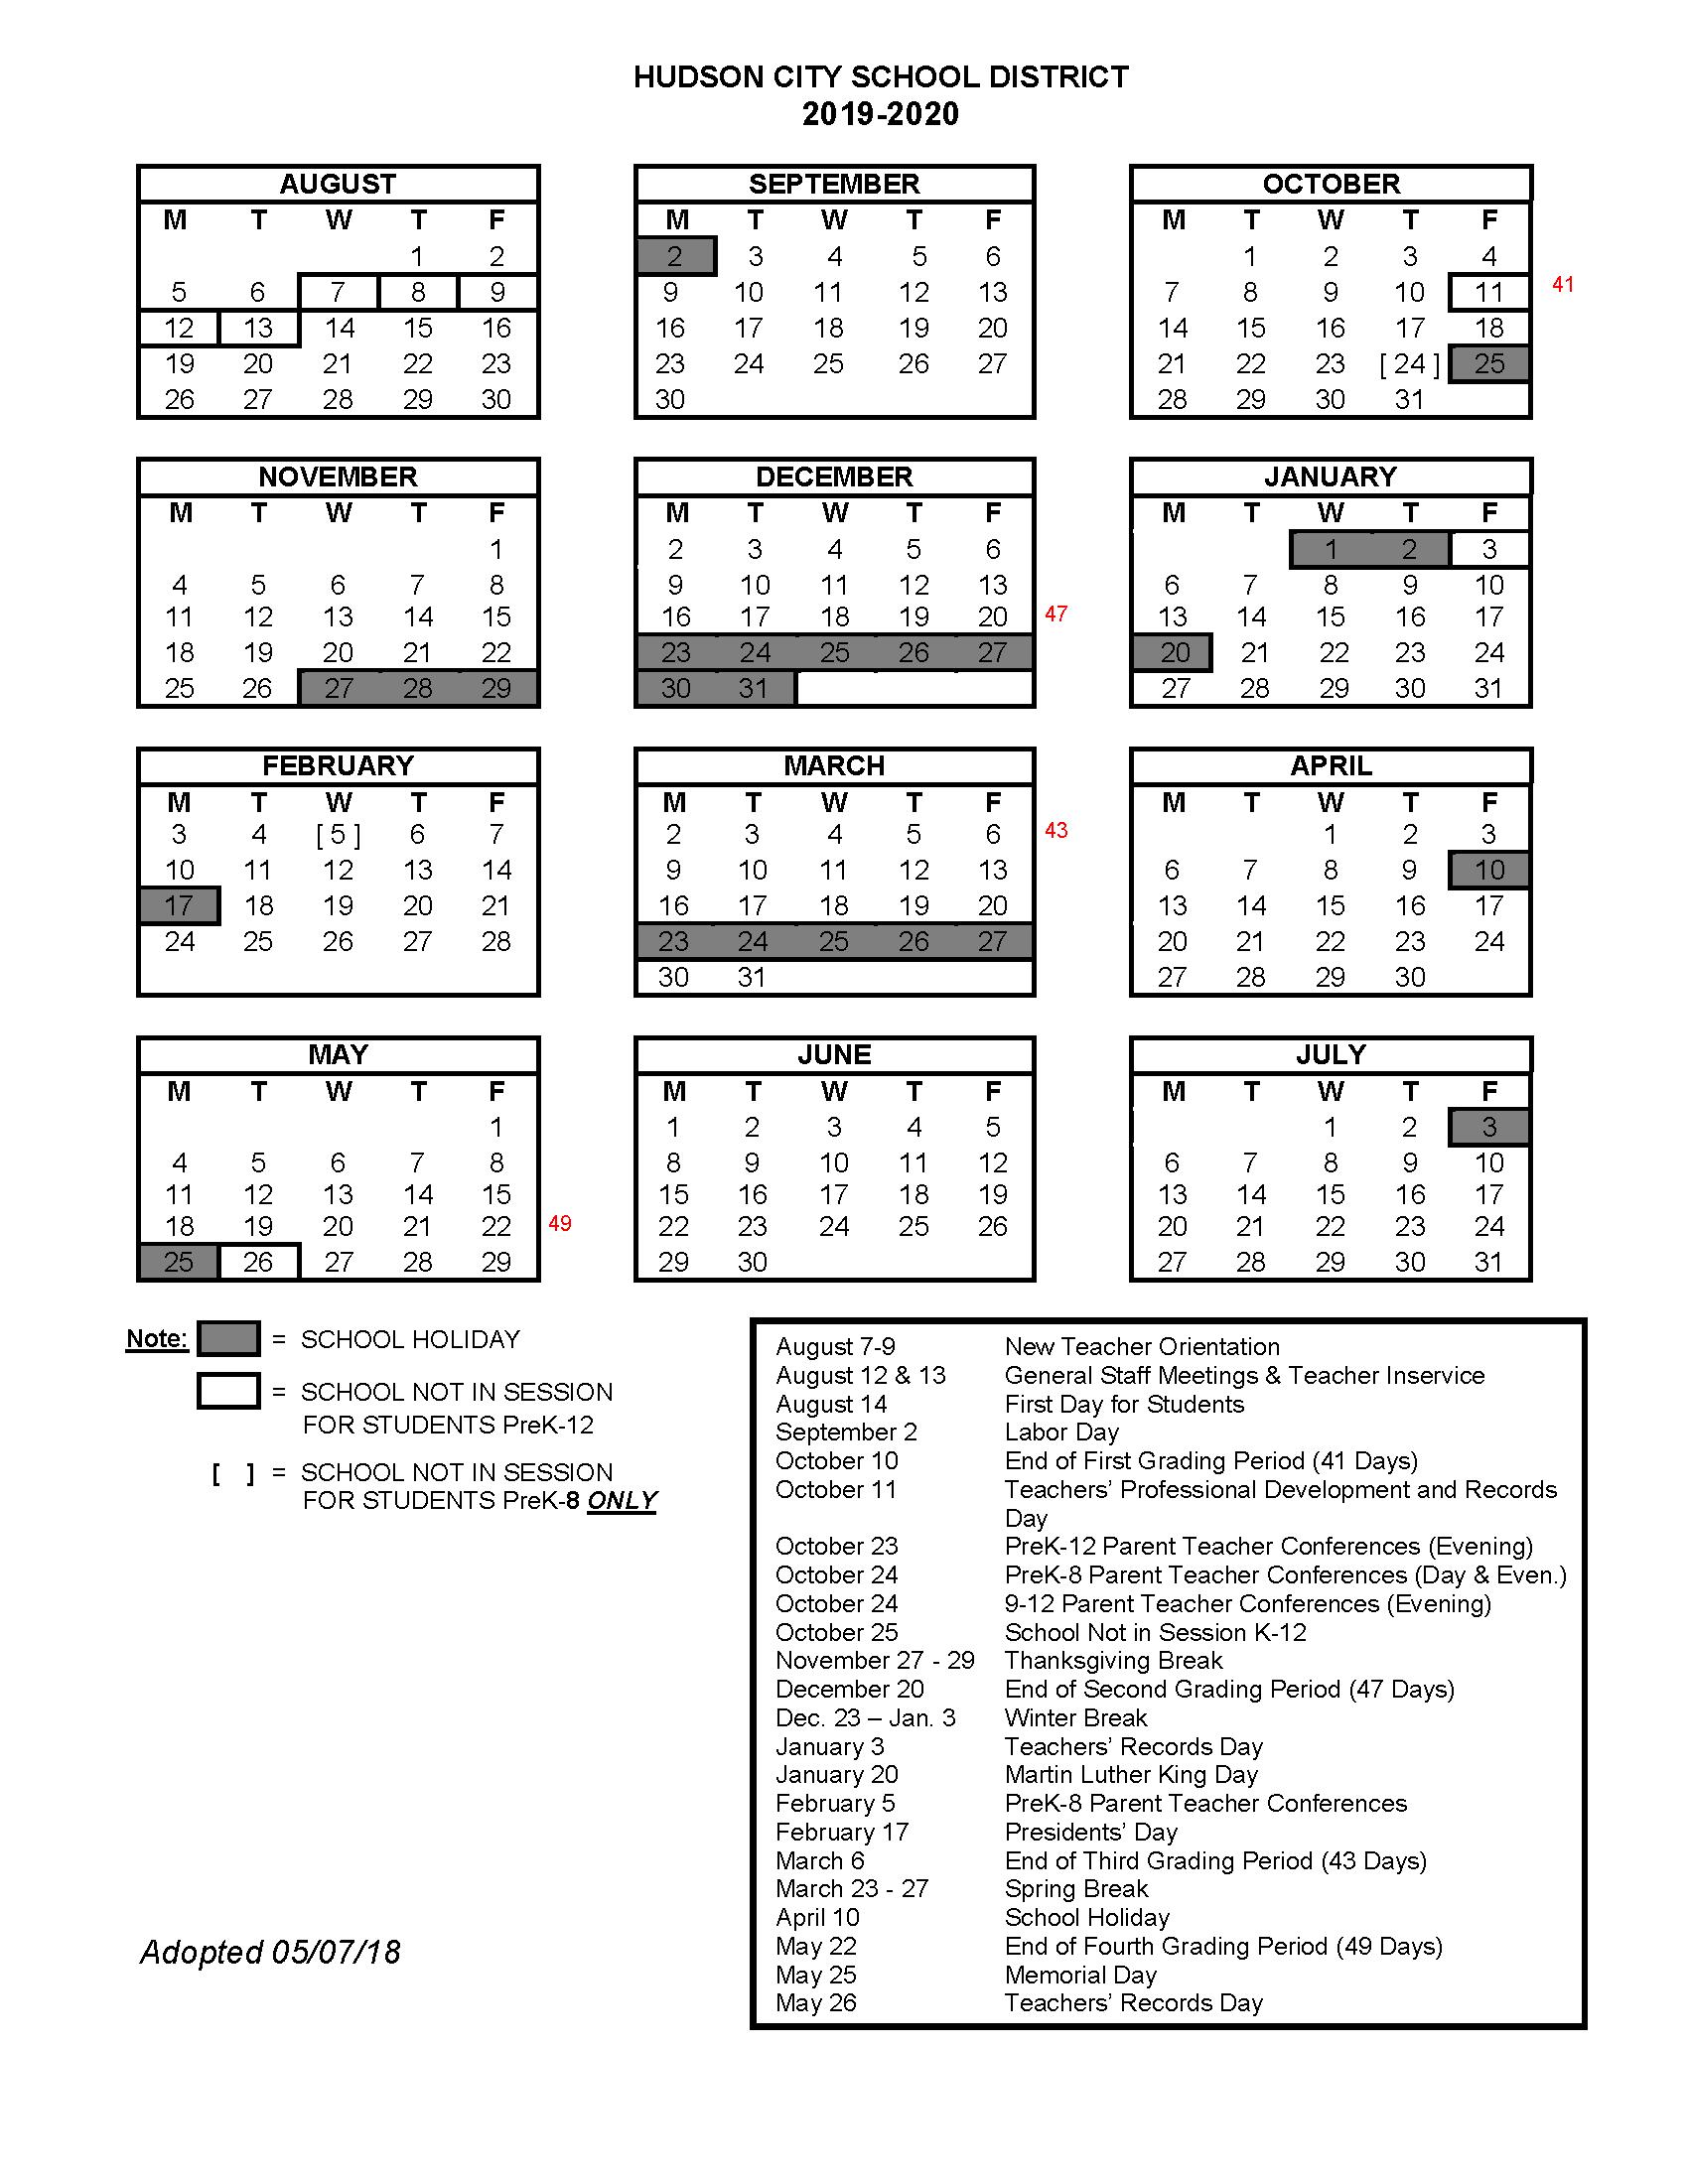 School Holidays Florida 2015 Lifehacked1st Com